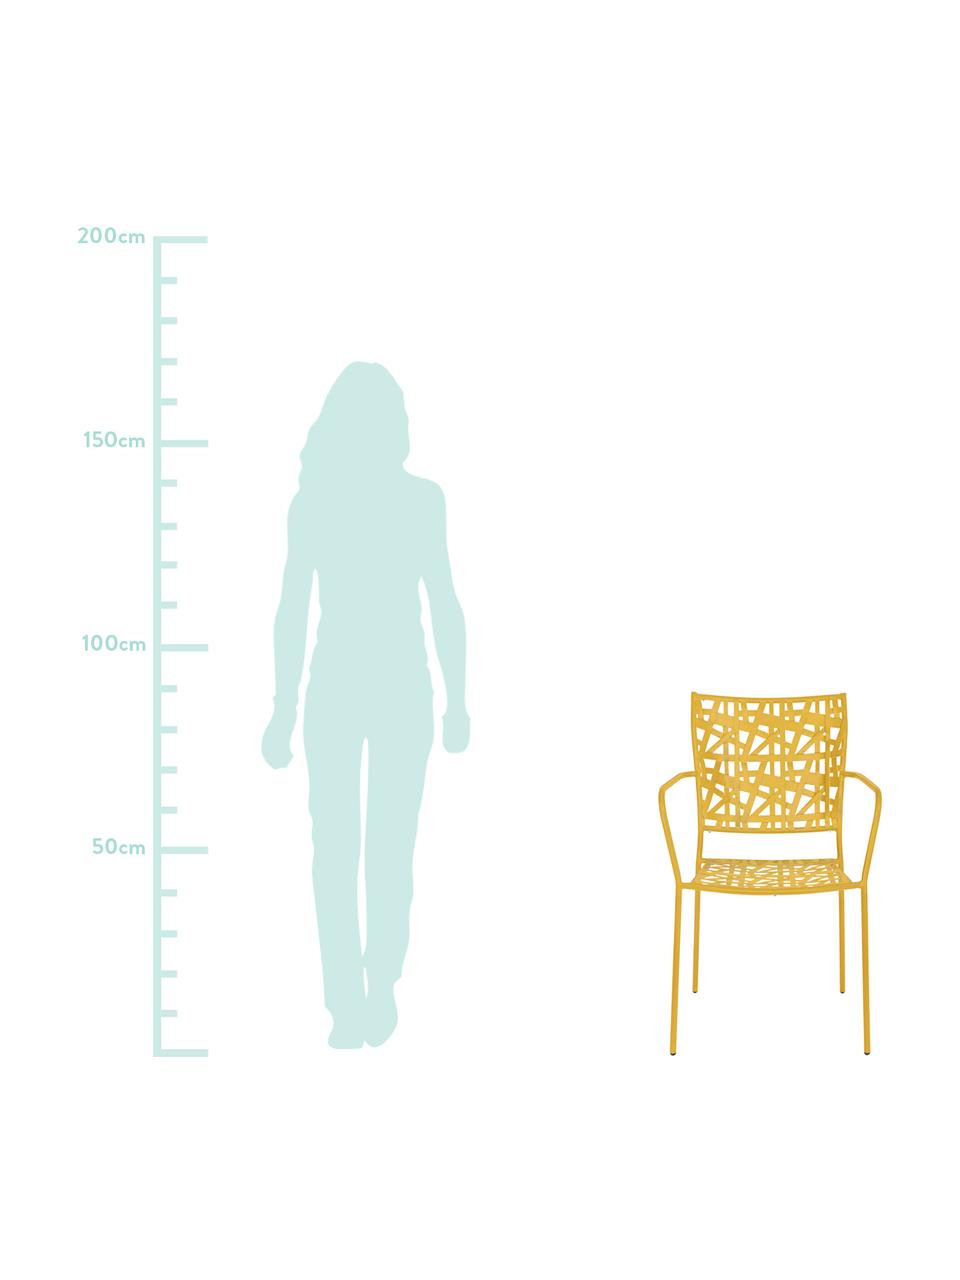 Sedia impilabile da giardino in metallo Kelsie, Metallo verniciato a polvere, Giallo, Larg. 55 x Prof. 54 cm